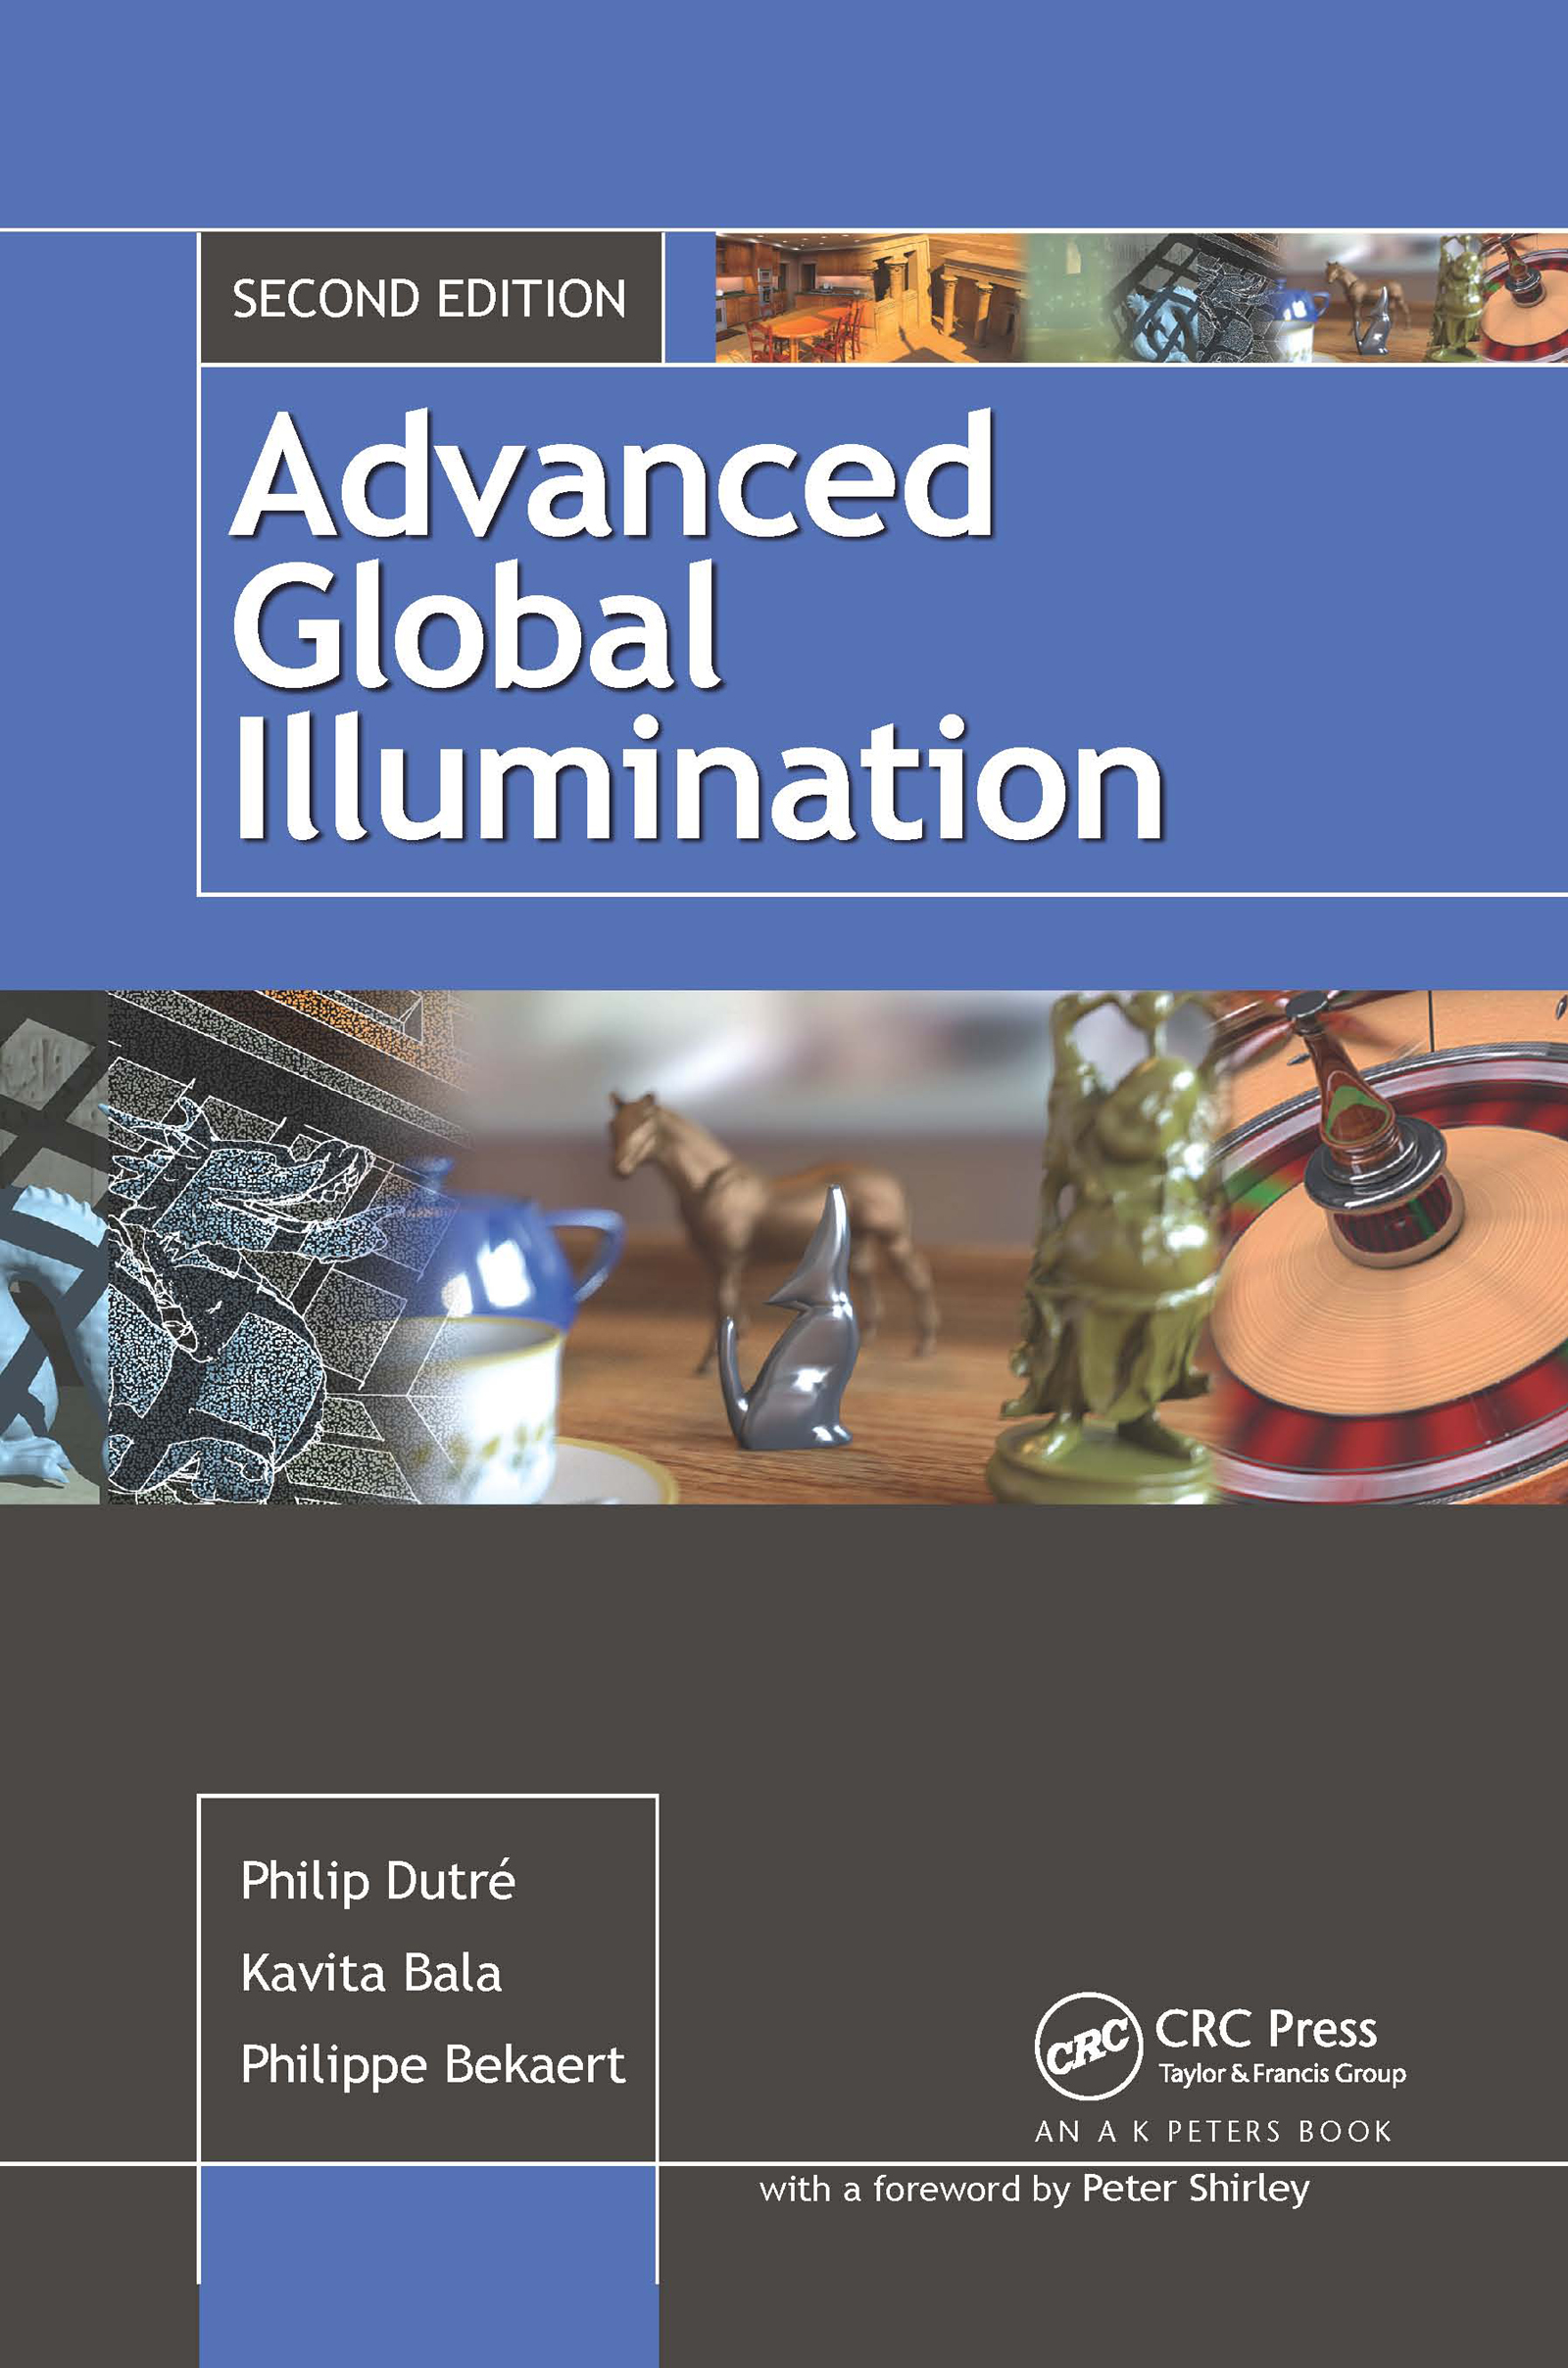 Advanced Global Illumination